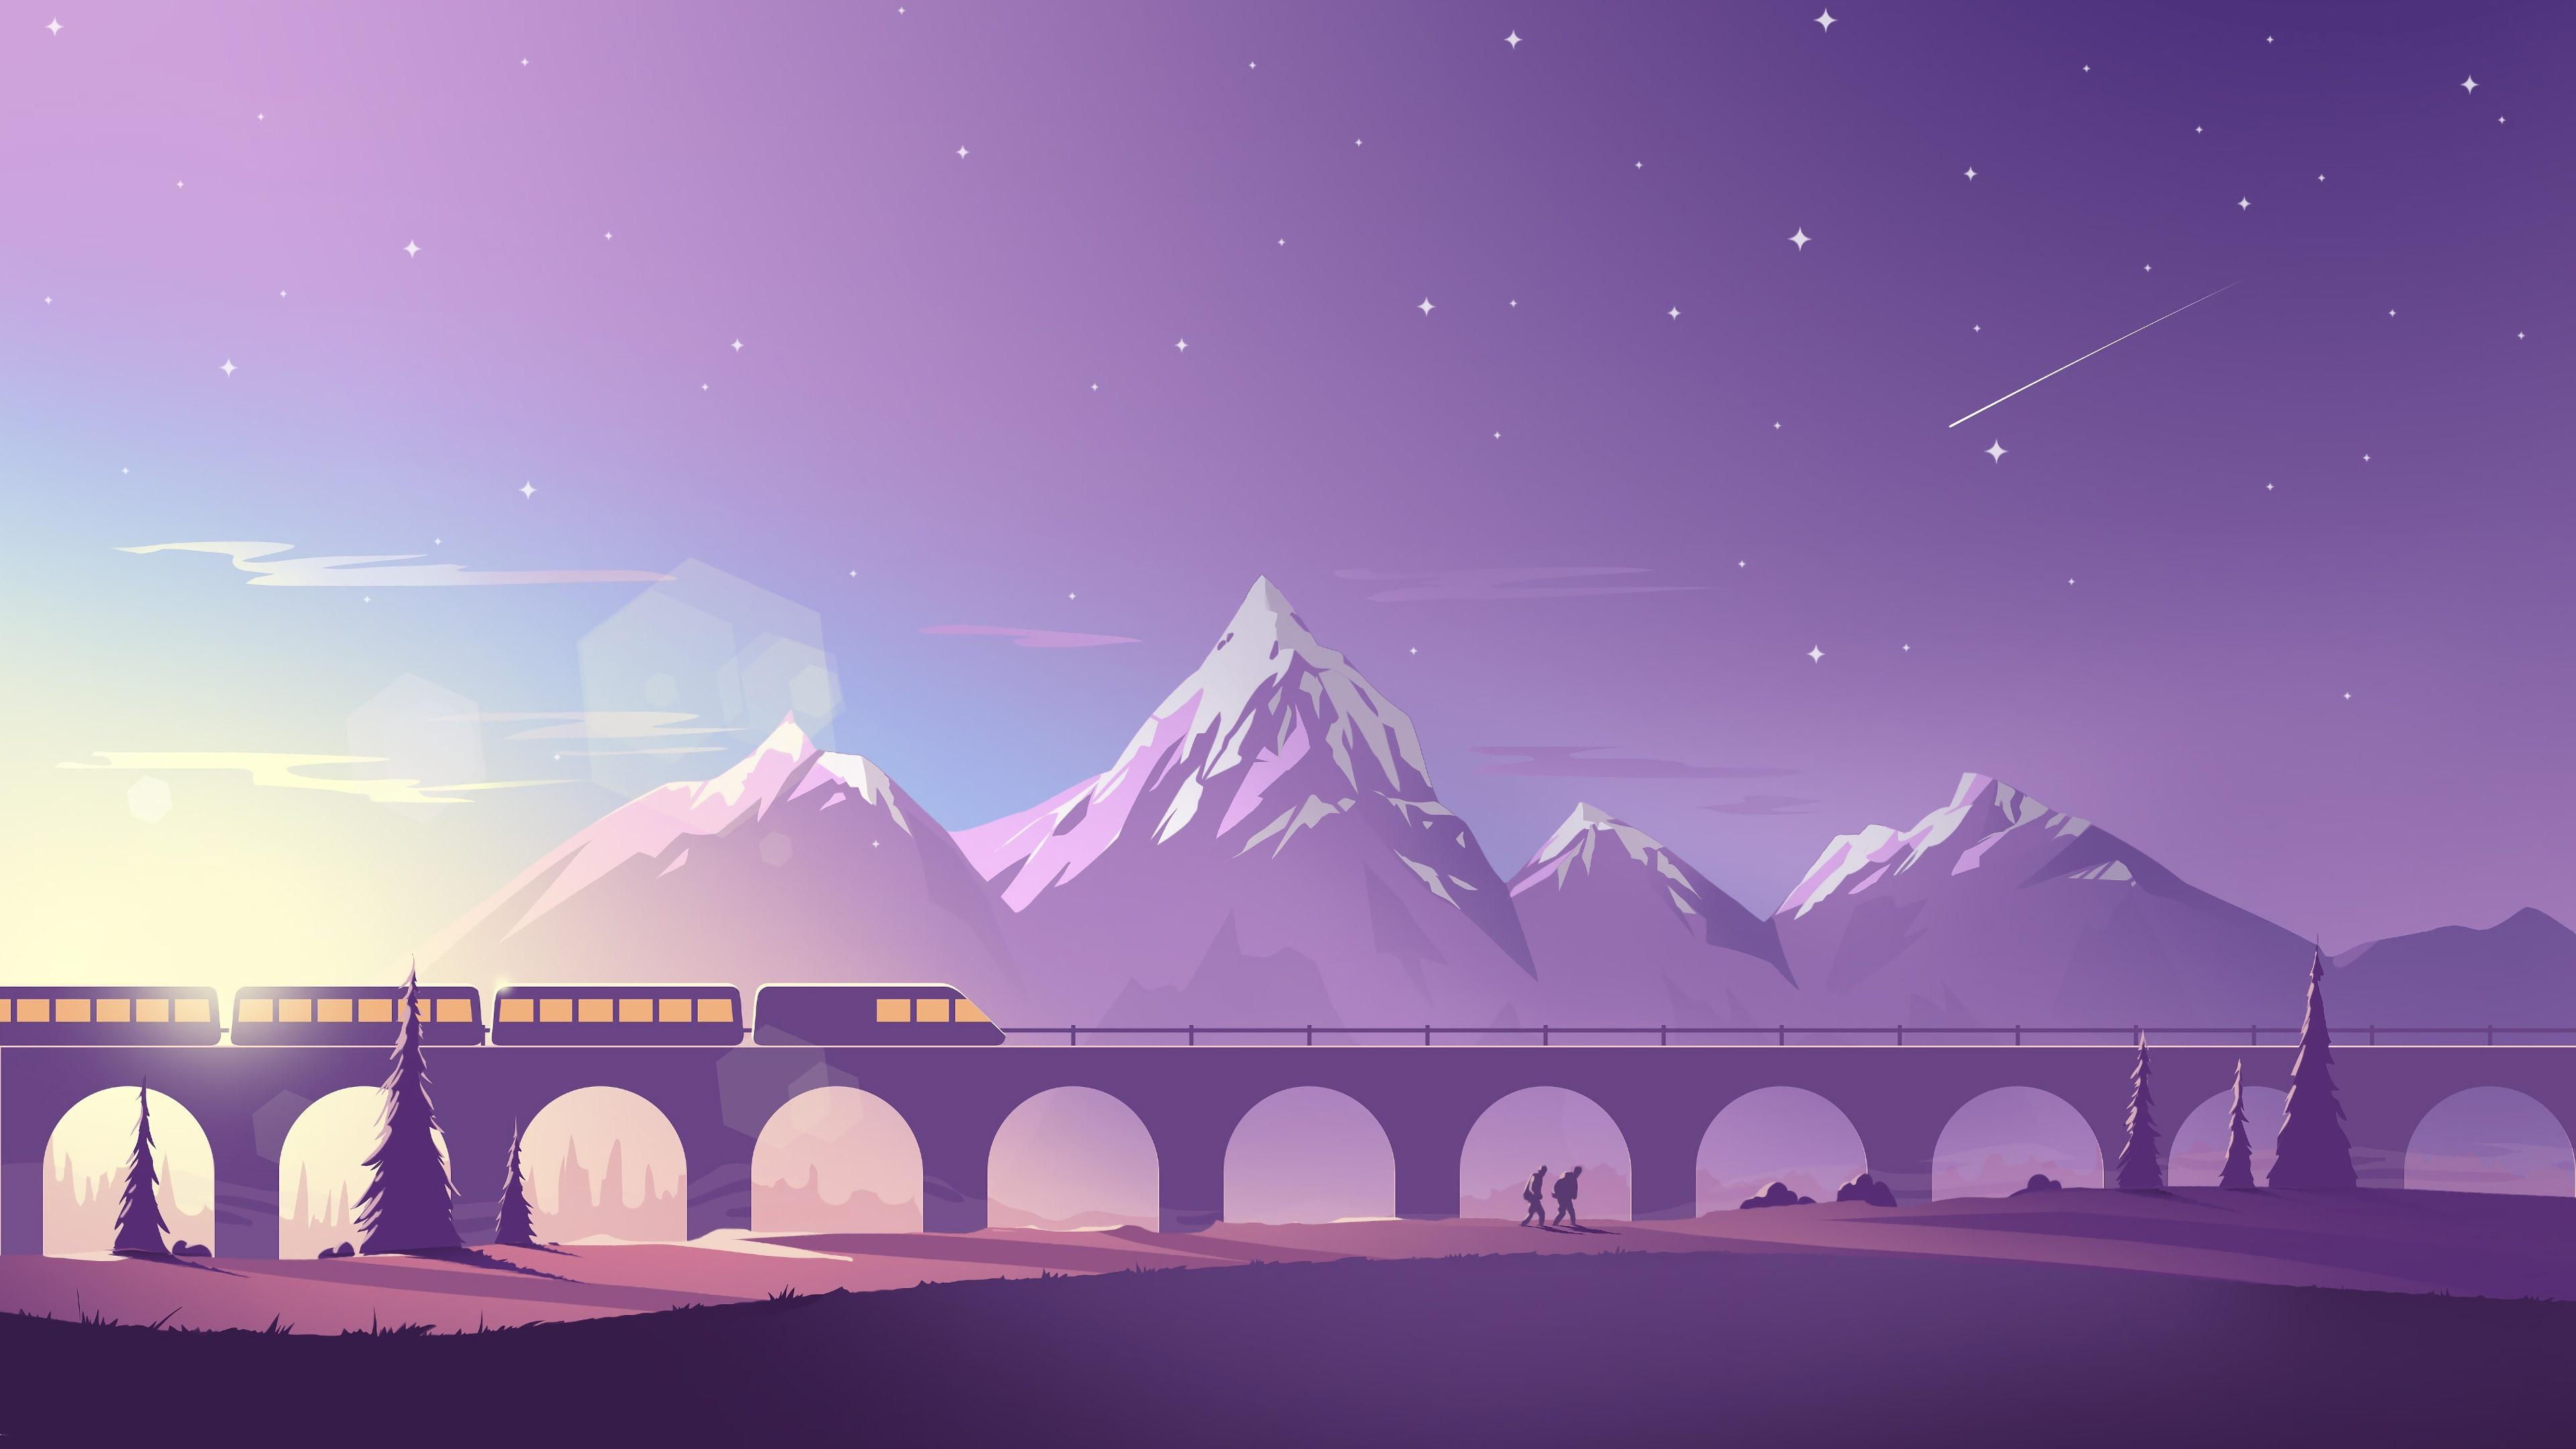 Wallpaper Bridge Train Mountains Vector Art Picture 3840x2160 Uhd 4k Picture Image